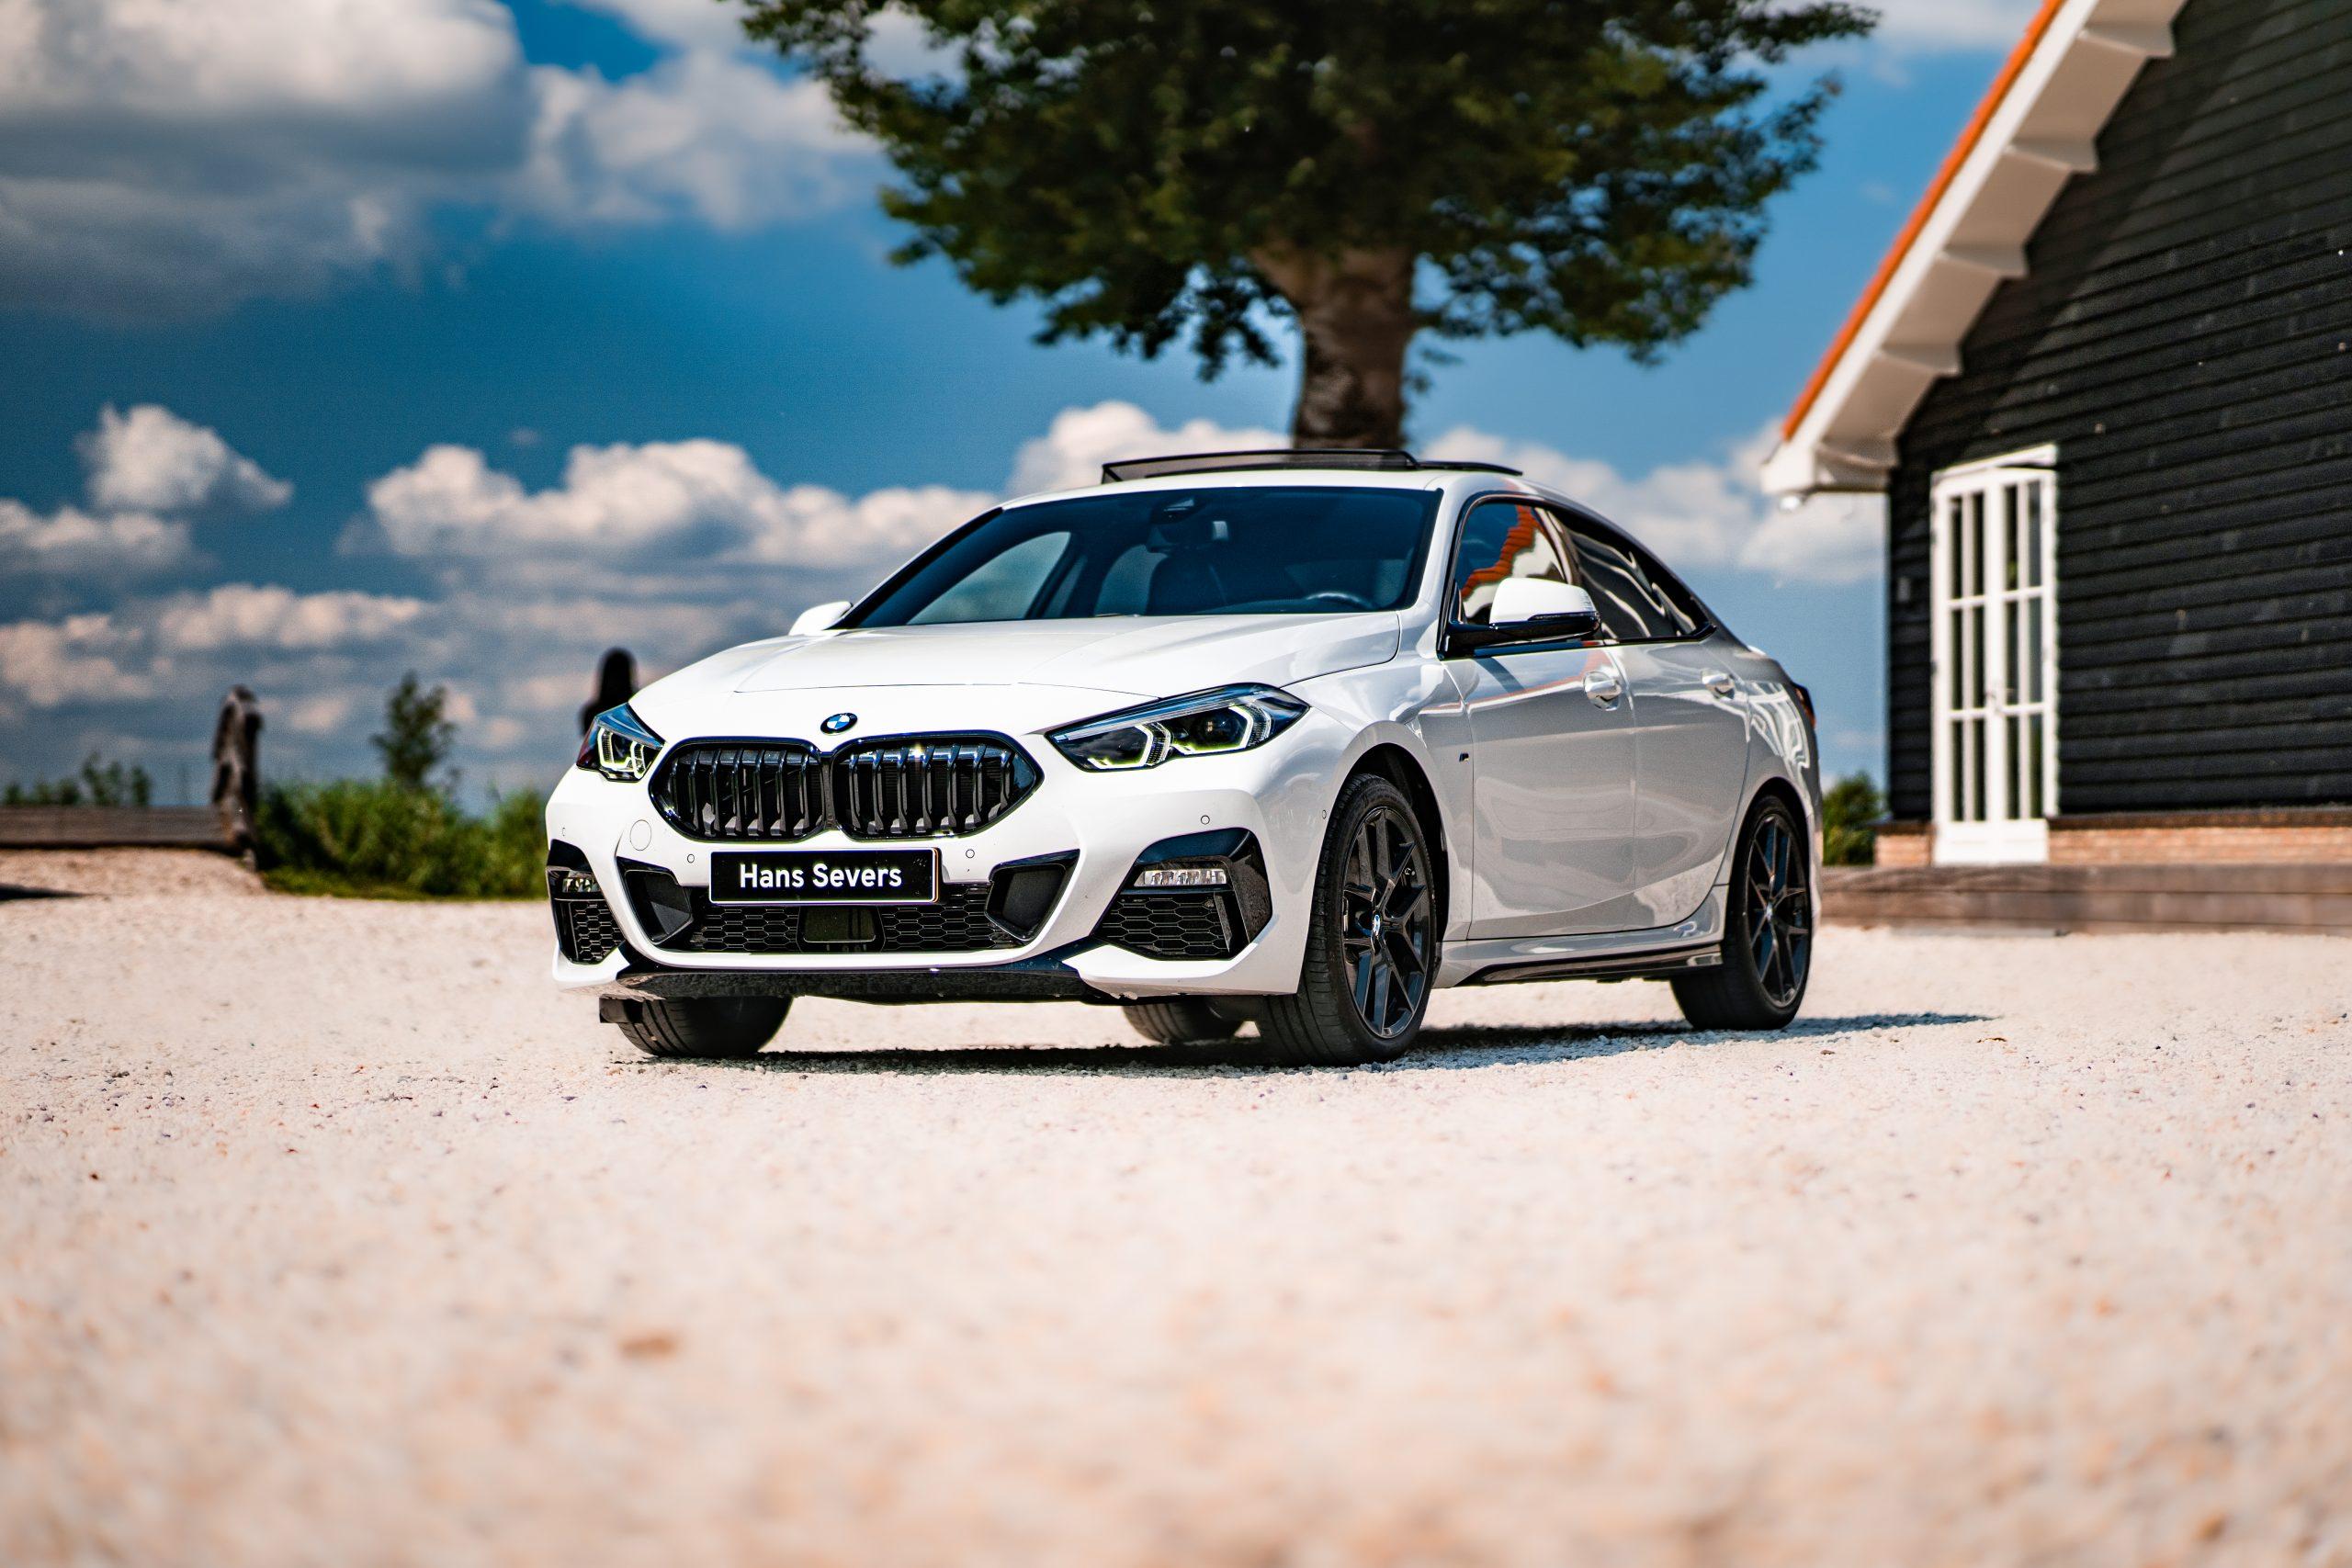 De nieuwe BMW 2 Serie Gran Coupé